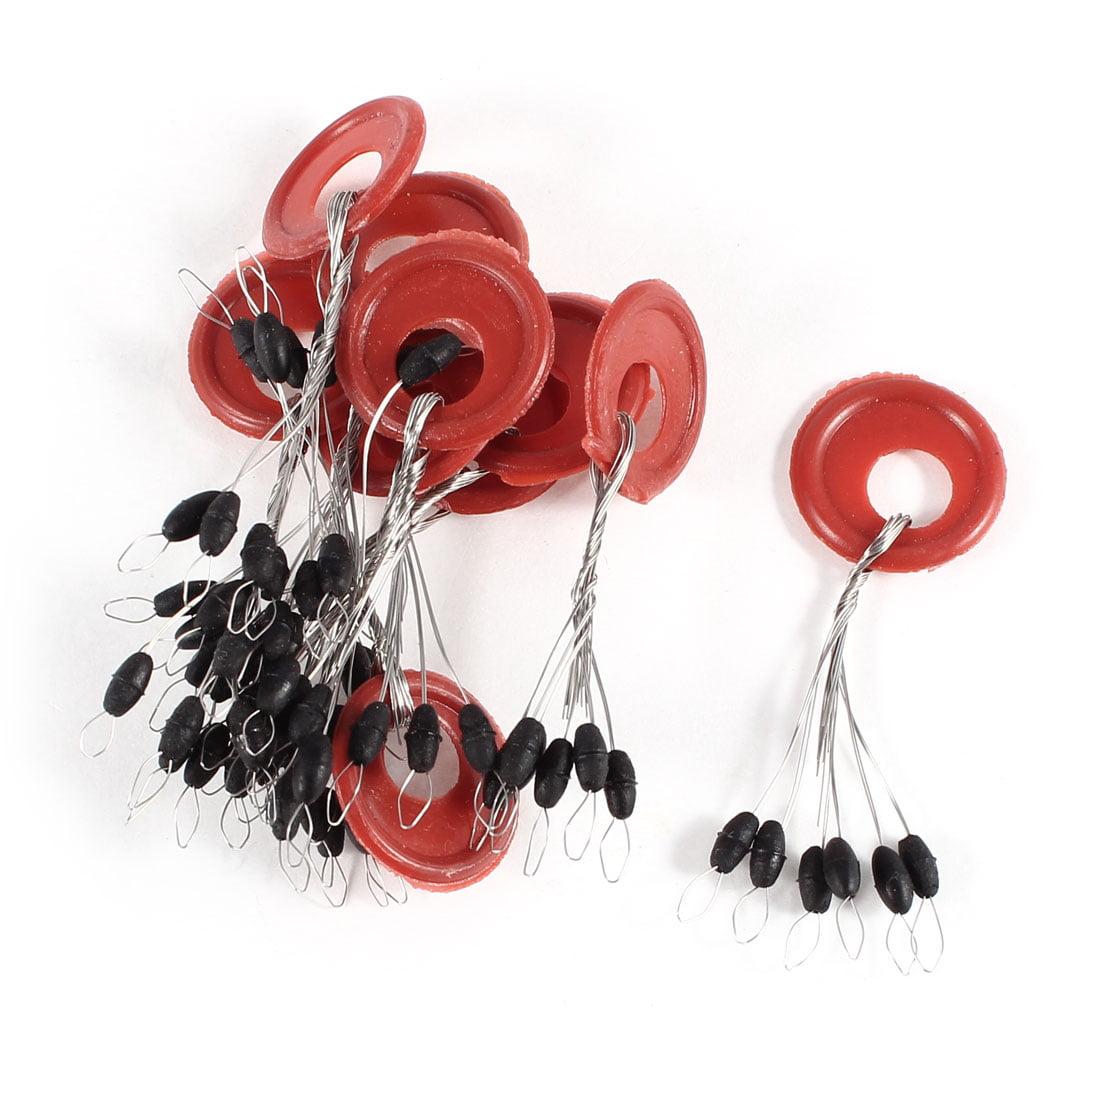 10 Pcs Black Beads Rubber Stopper 6 in 1 Fishing Floater Bobber Sinker by Unique-Bargains